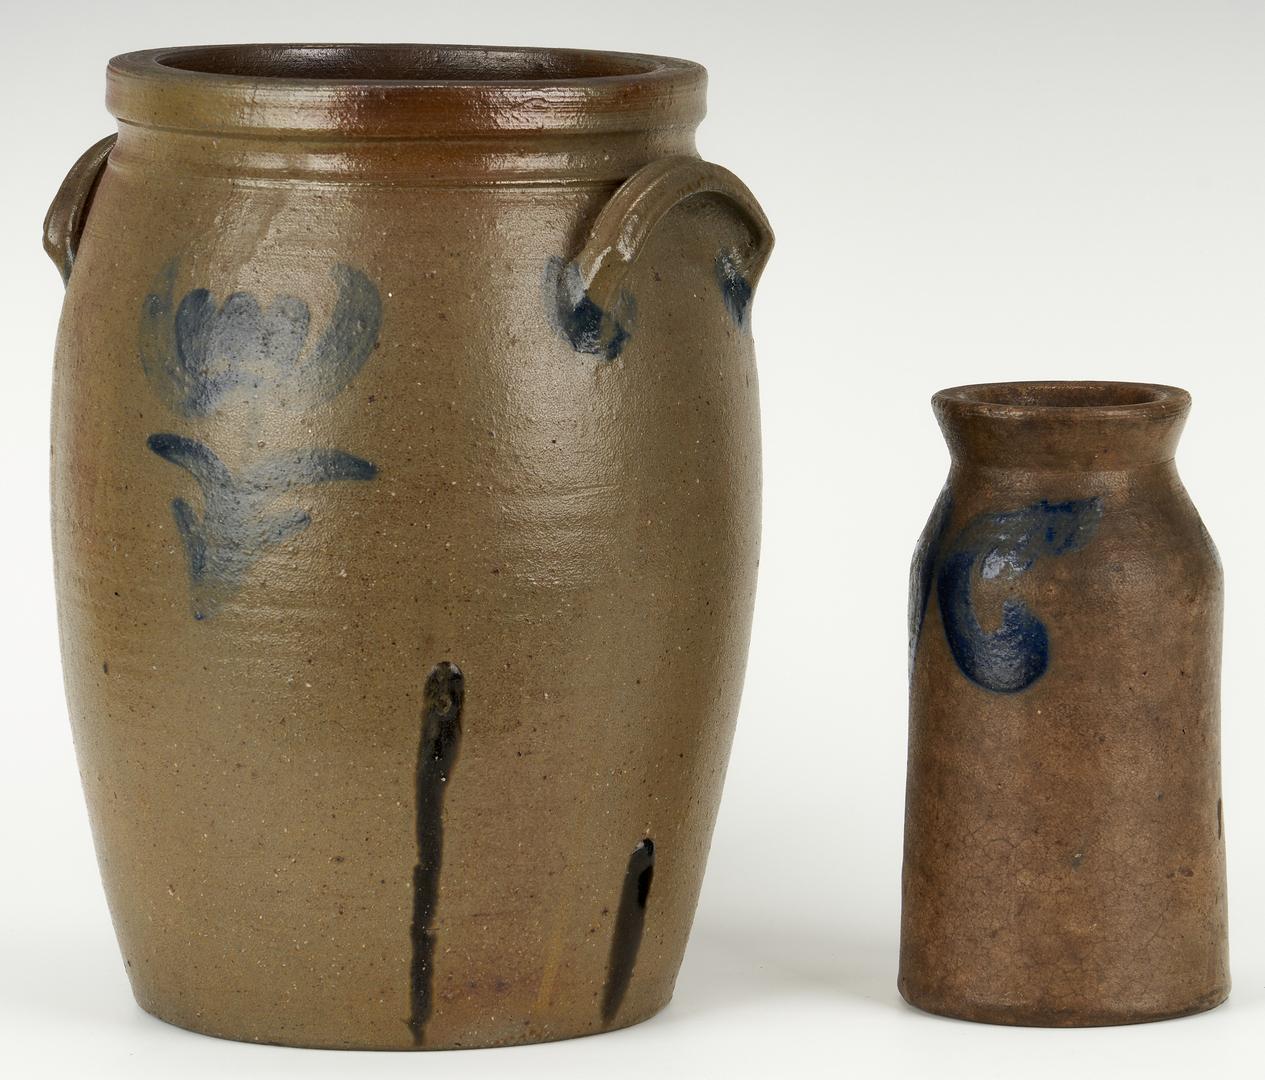 Lot 400: Charles Decker Stoneware Crock & S. Bell Jar